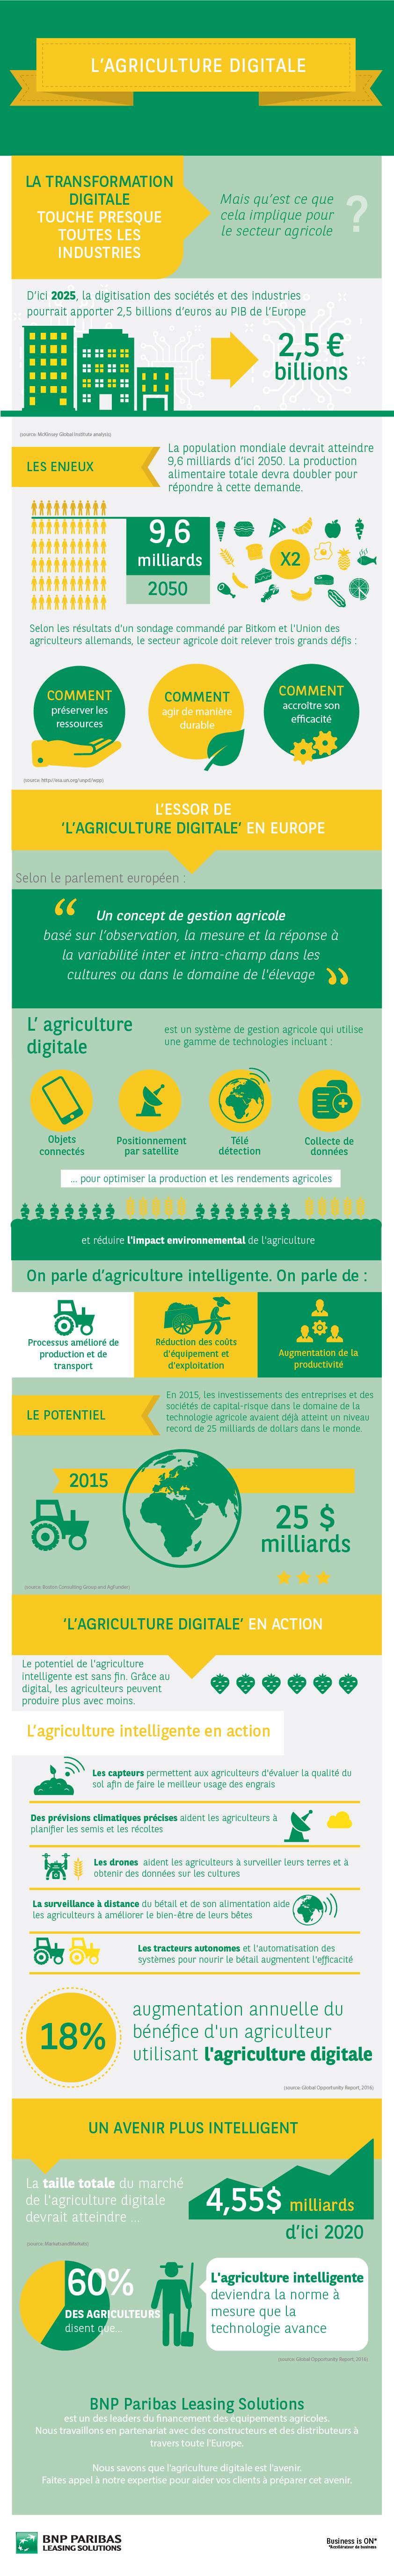 L'agriculture digitale